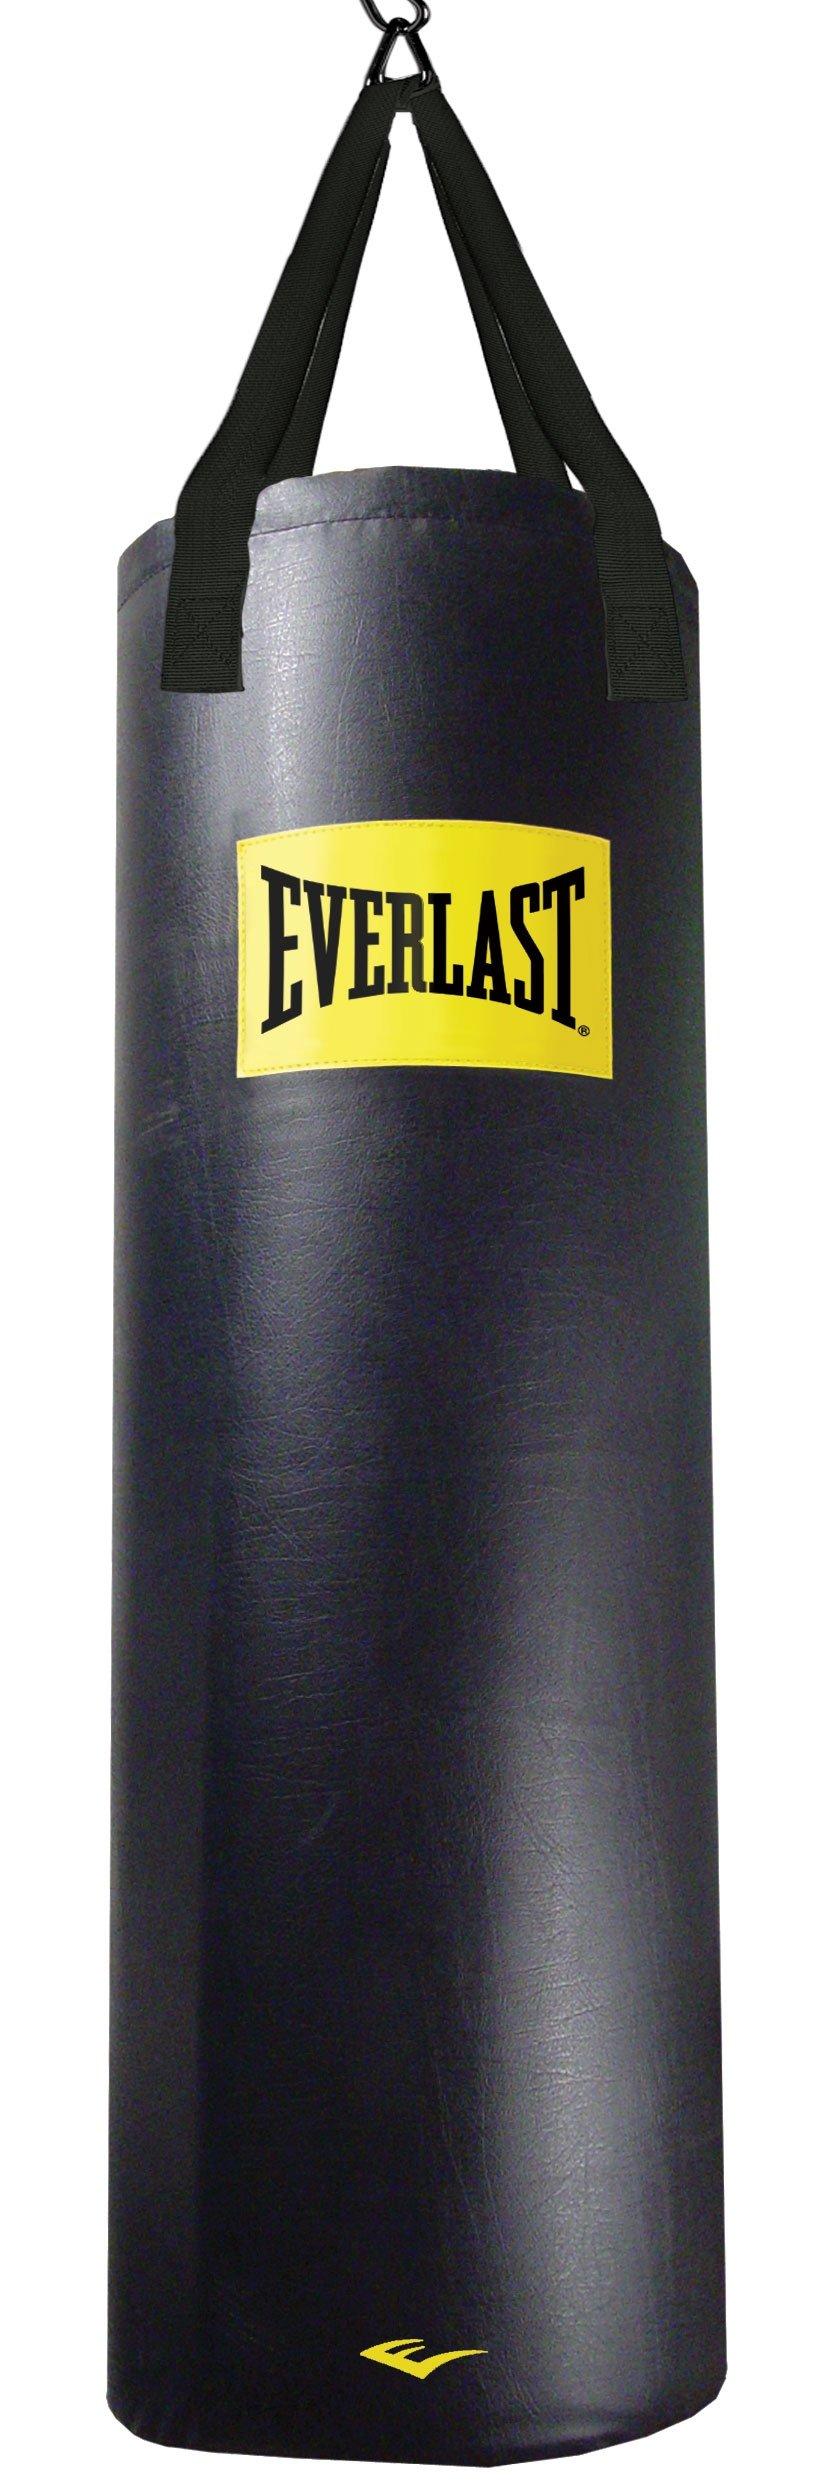 Everlast 100-Pound Nevatear Heavy Bag (Traditional Logo) by Everlast